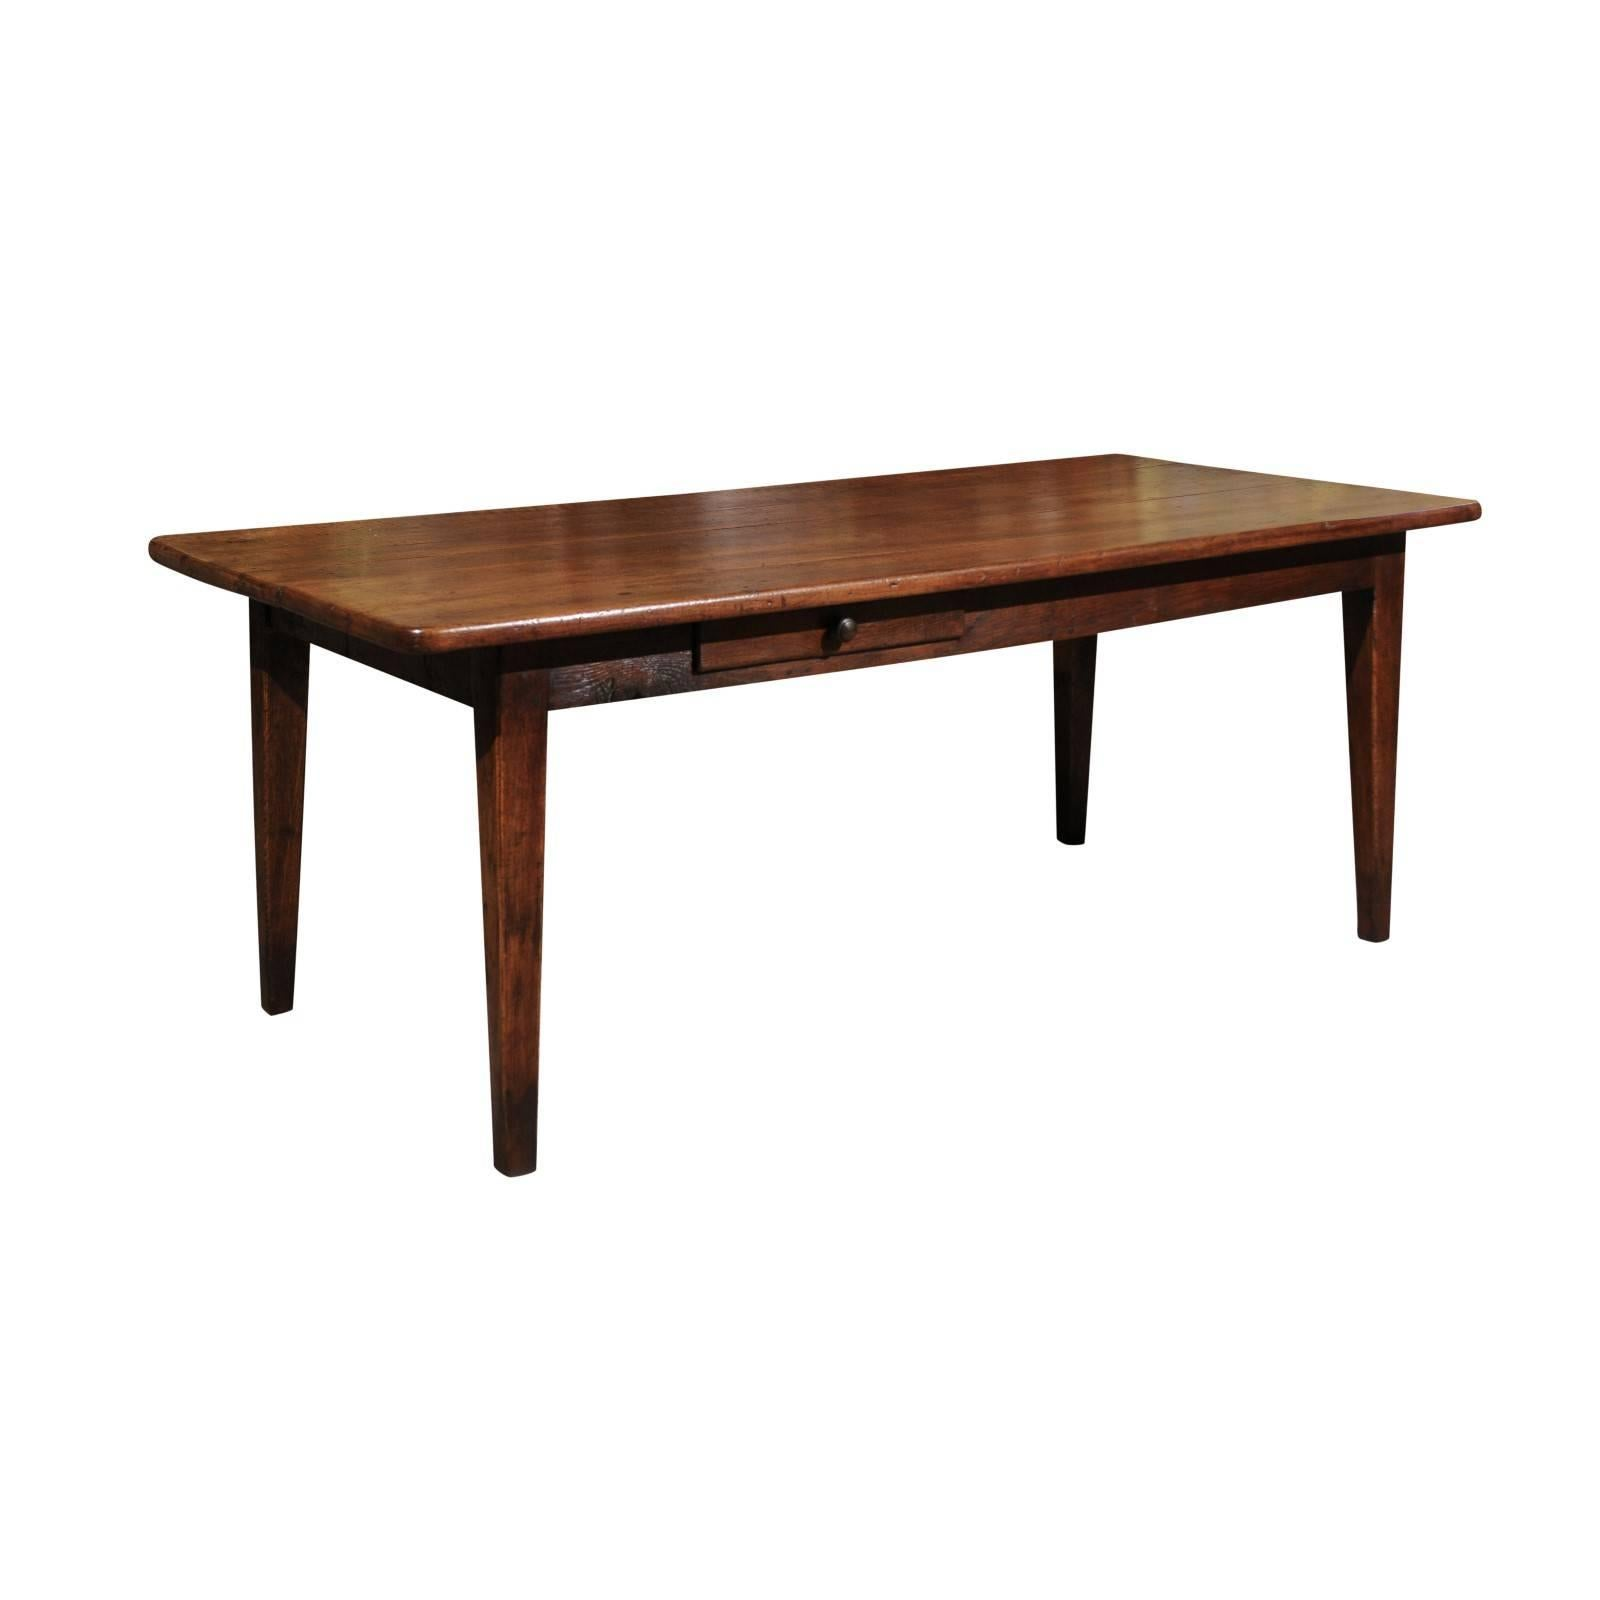 Amazing 19th Century French Walnut Farm Table, Circa 1880 For Sale